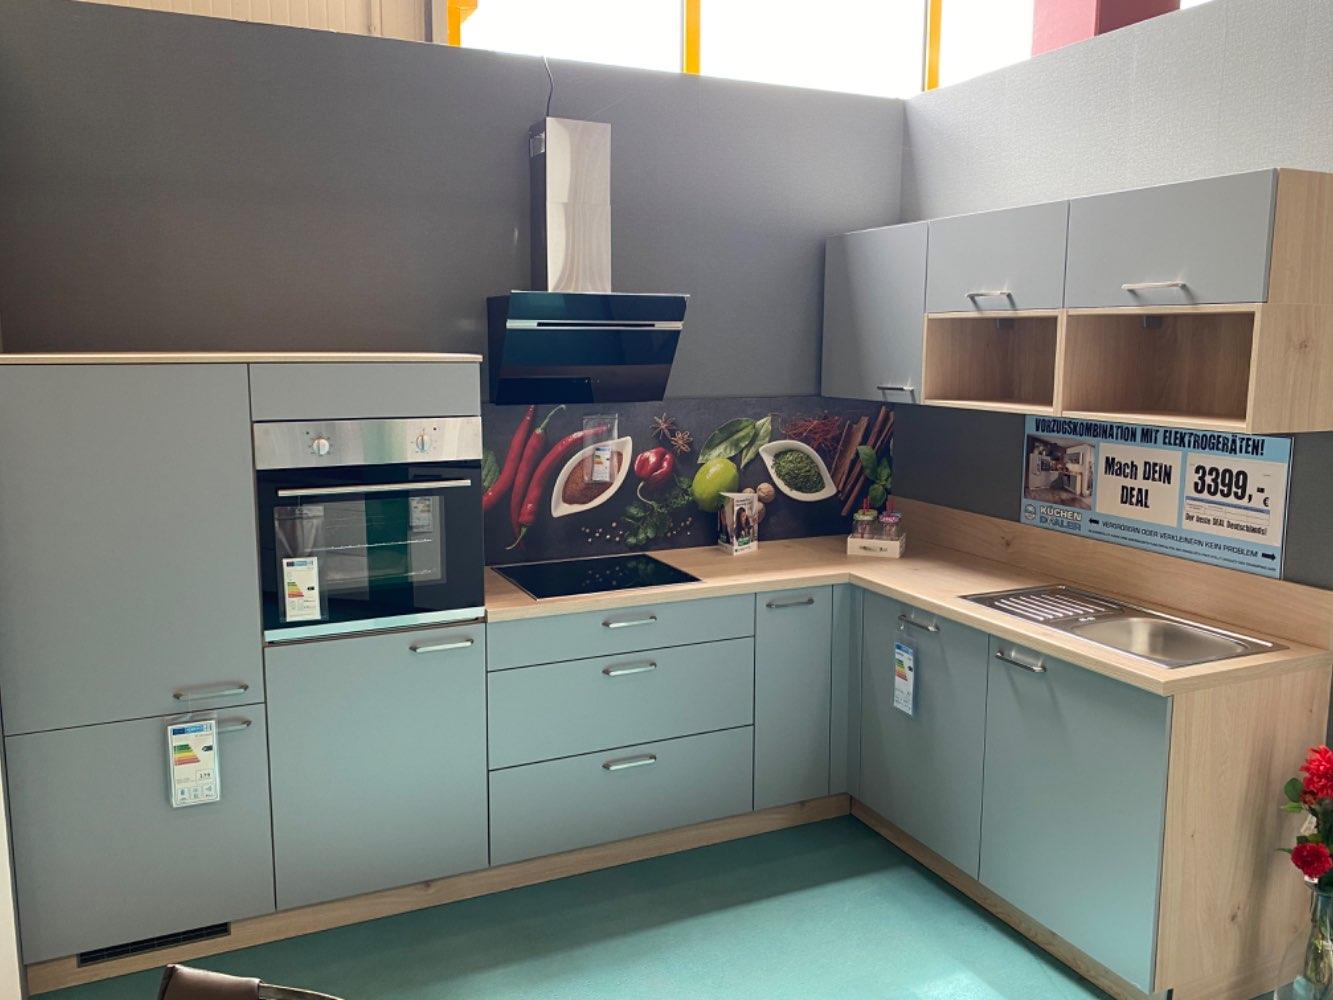 Einbauküche Zirkon / Küche mit E-Geräten Top Deal Koje 28